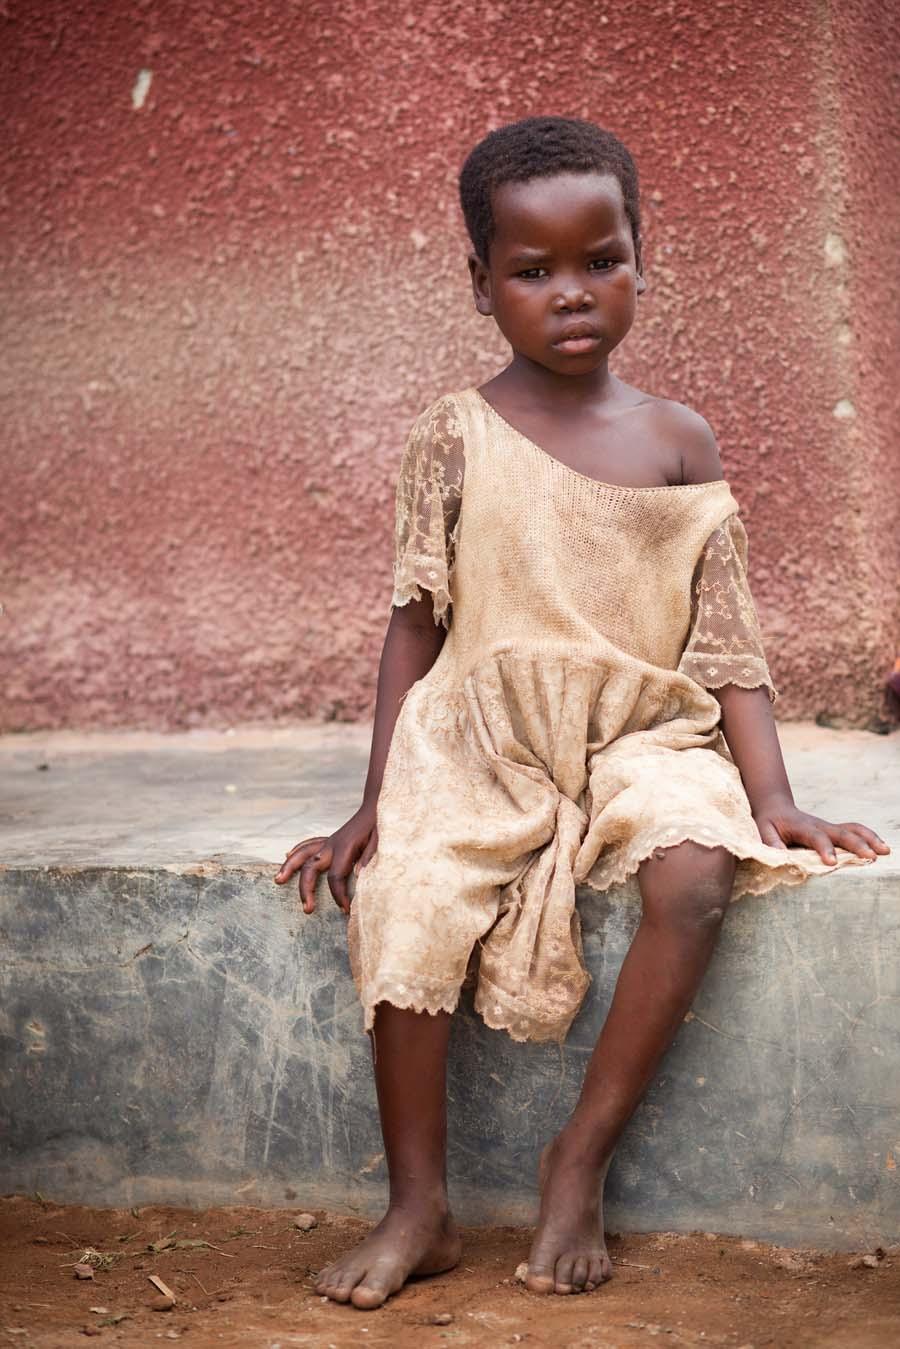 jessicadavisphotography.com | Jessica Davis Photography | Portrait Work in Uganda| Travel Photographer | World Event Photographs 6 (1).jpg